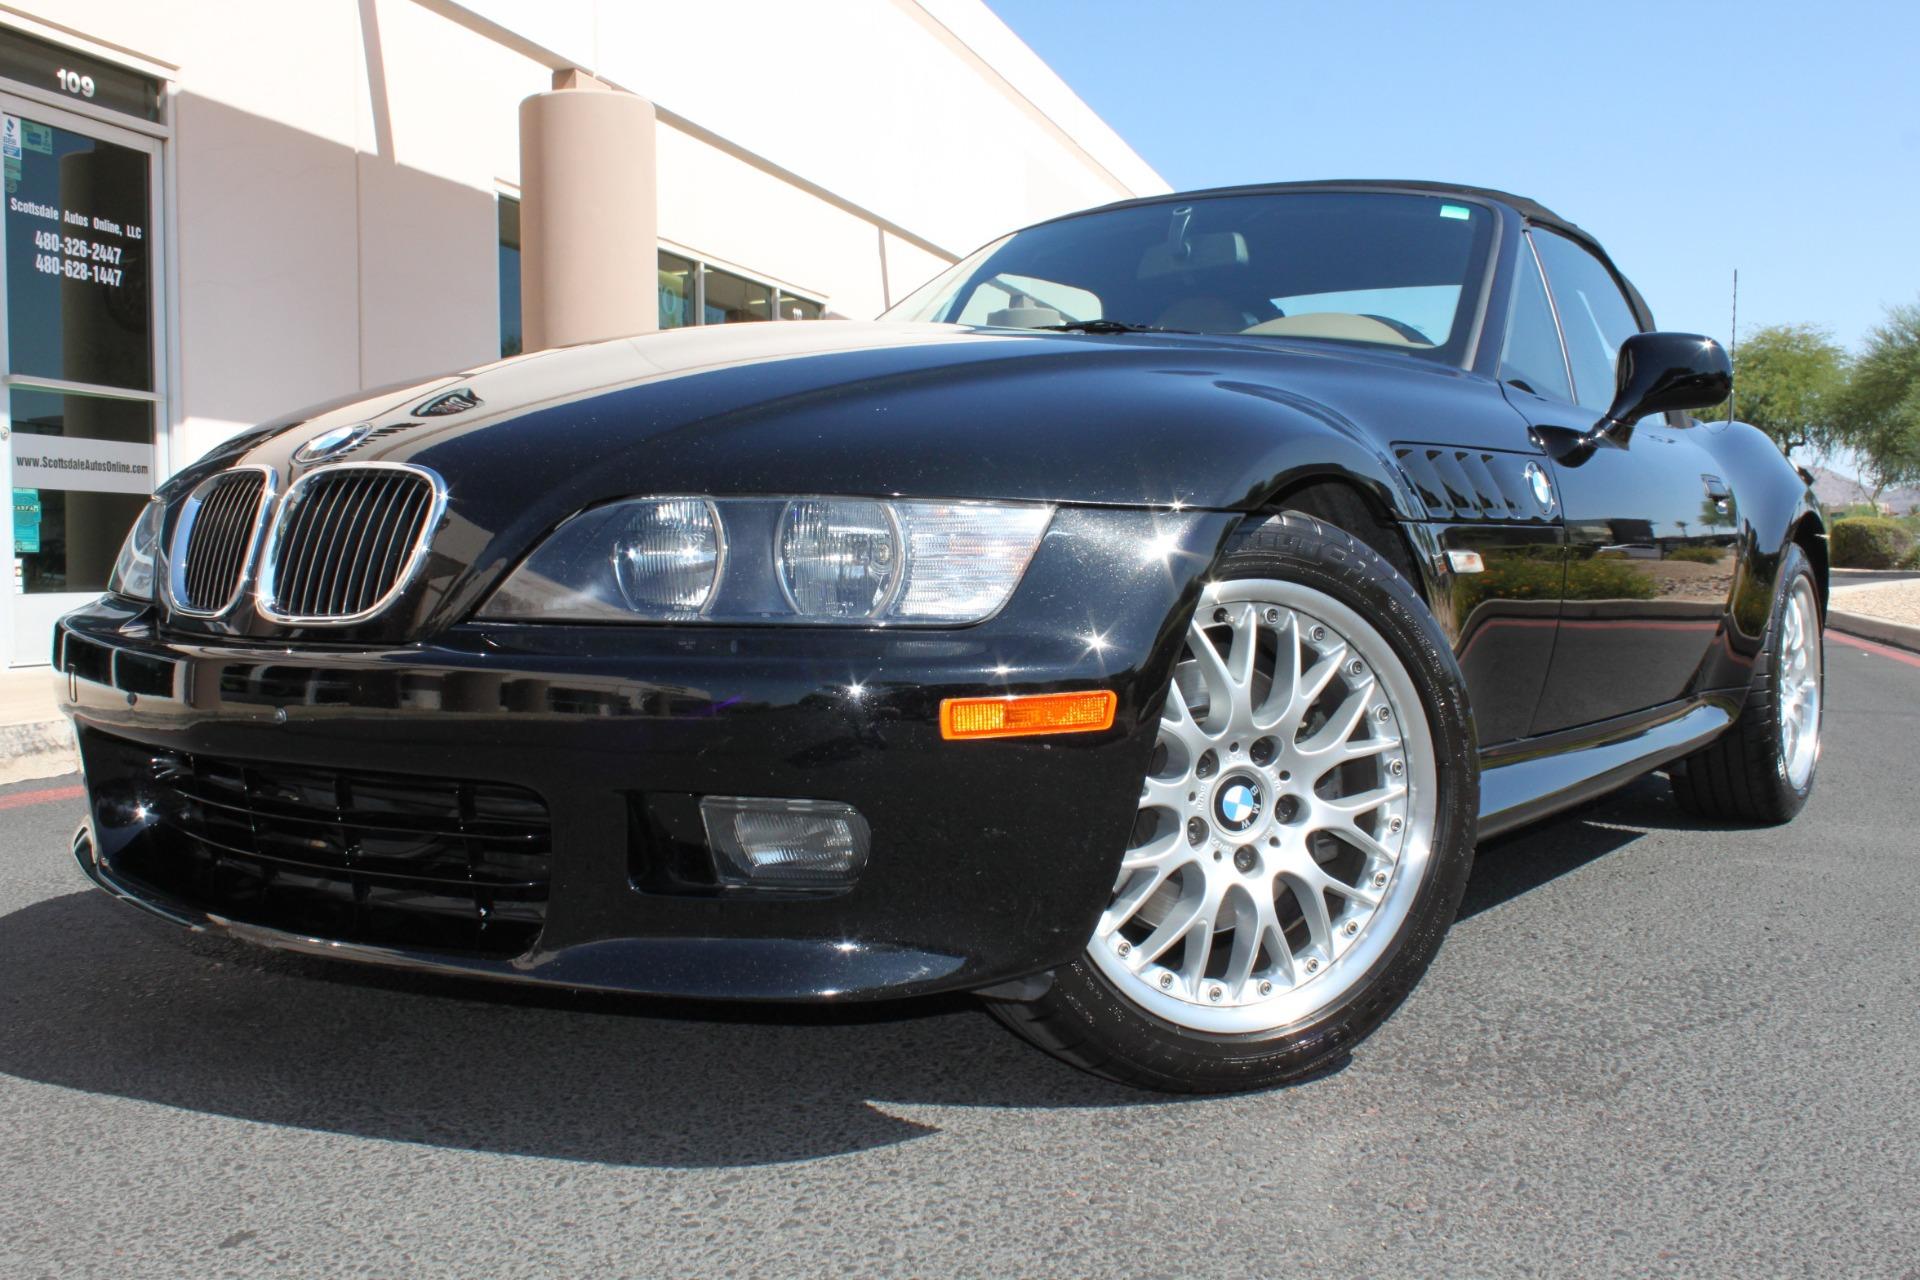 Used 2001 BMW Z3 <span>3.0i Roadster</span> | Scottsdale, AZ